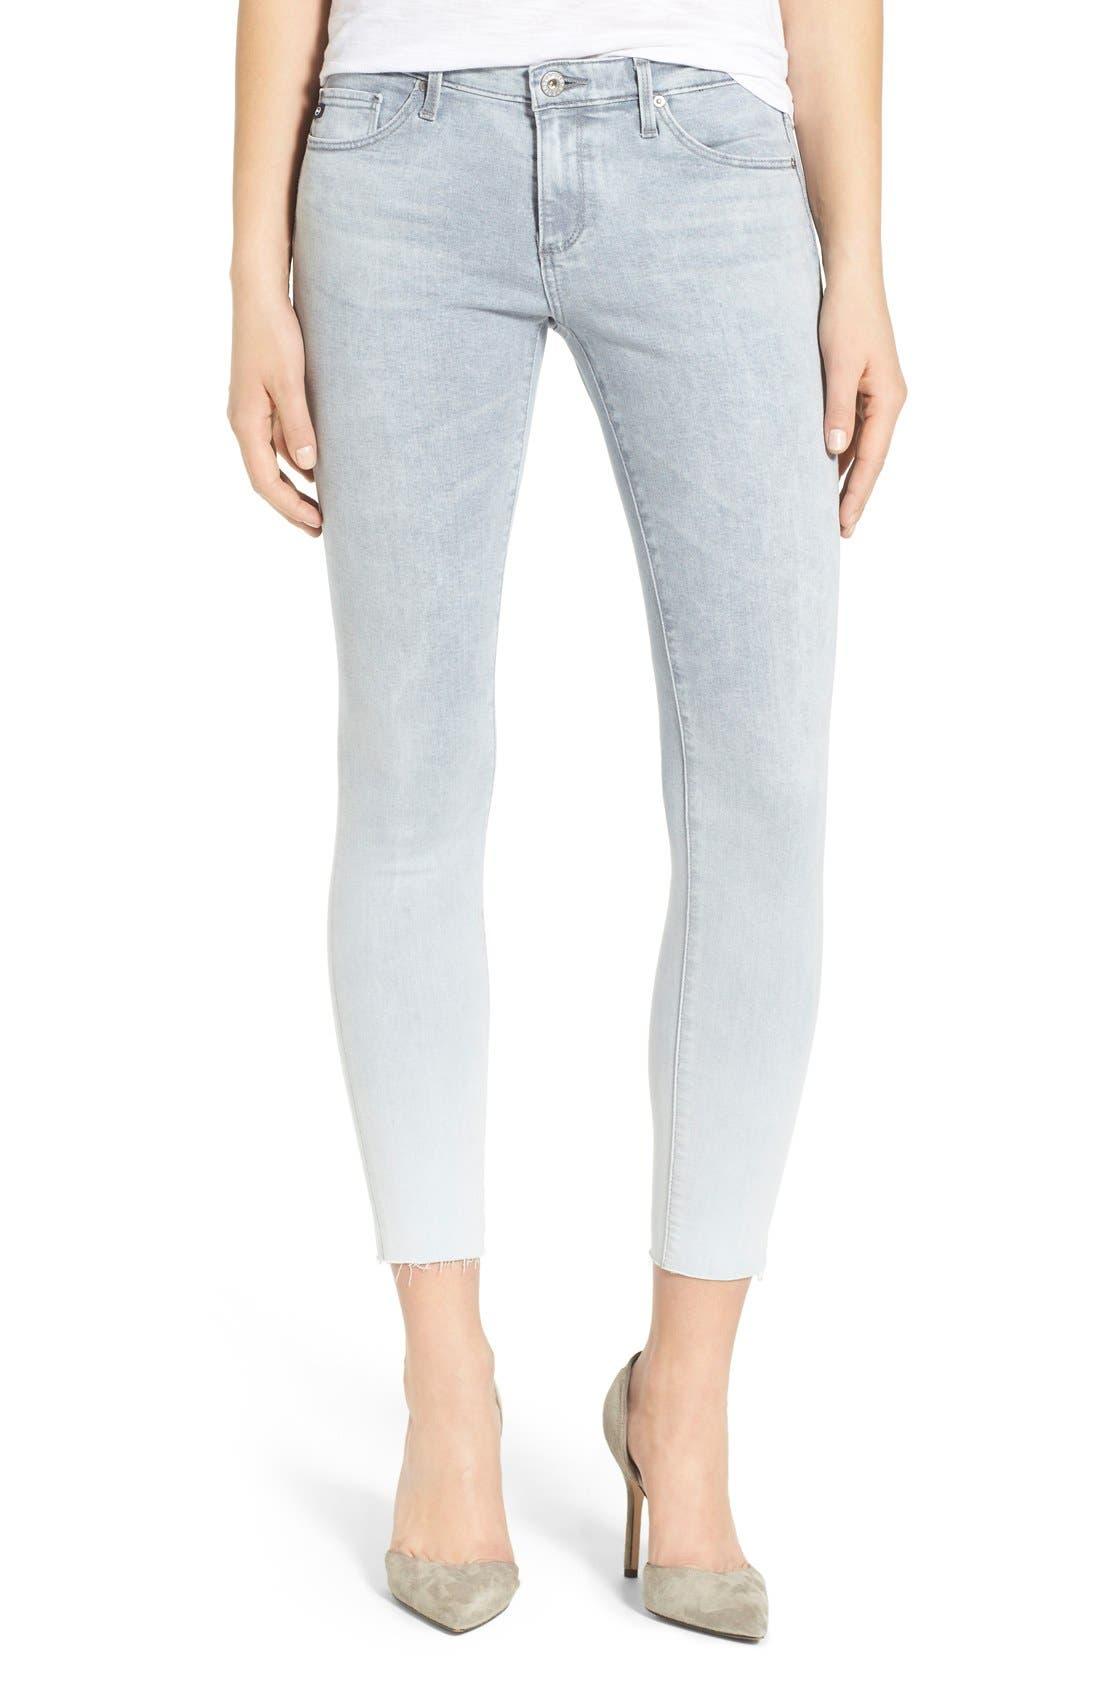 Main Image - AG 'The Legging' Raw Edge Ankle Skinny Jeans (Mystic Grey)